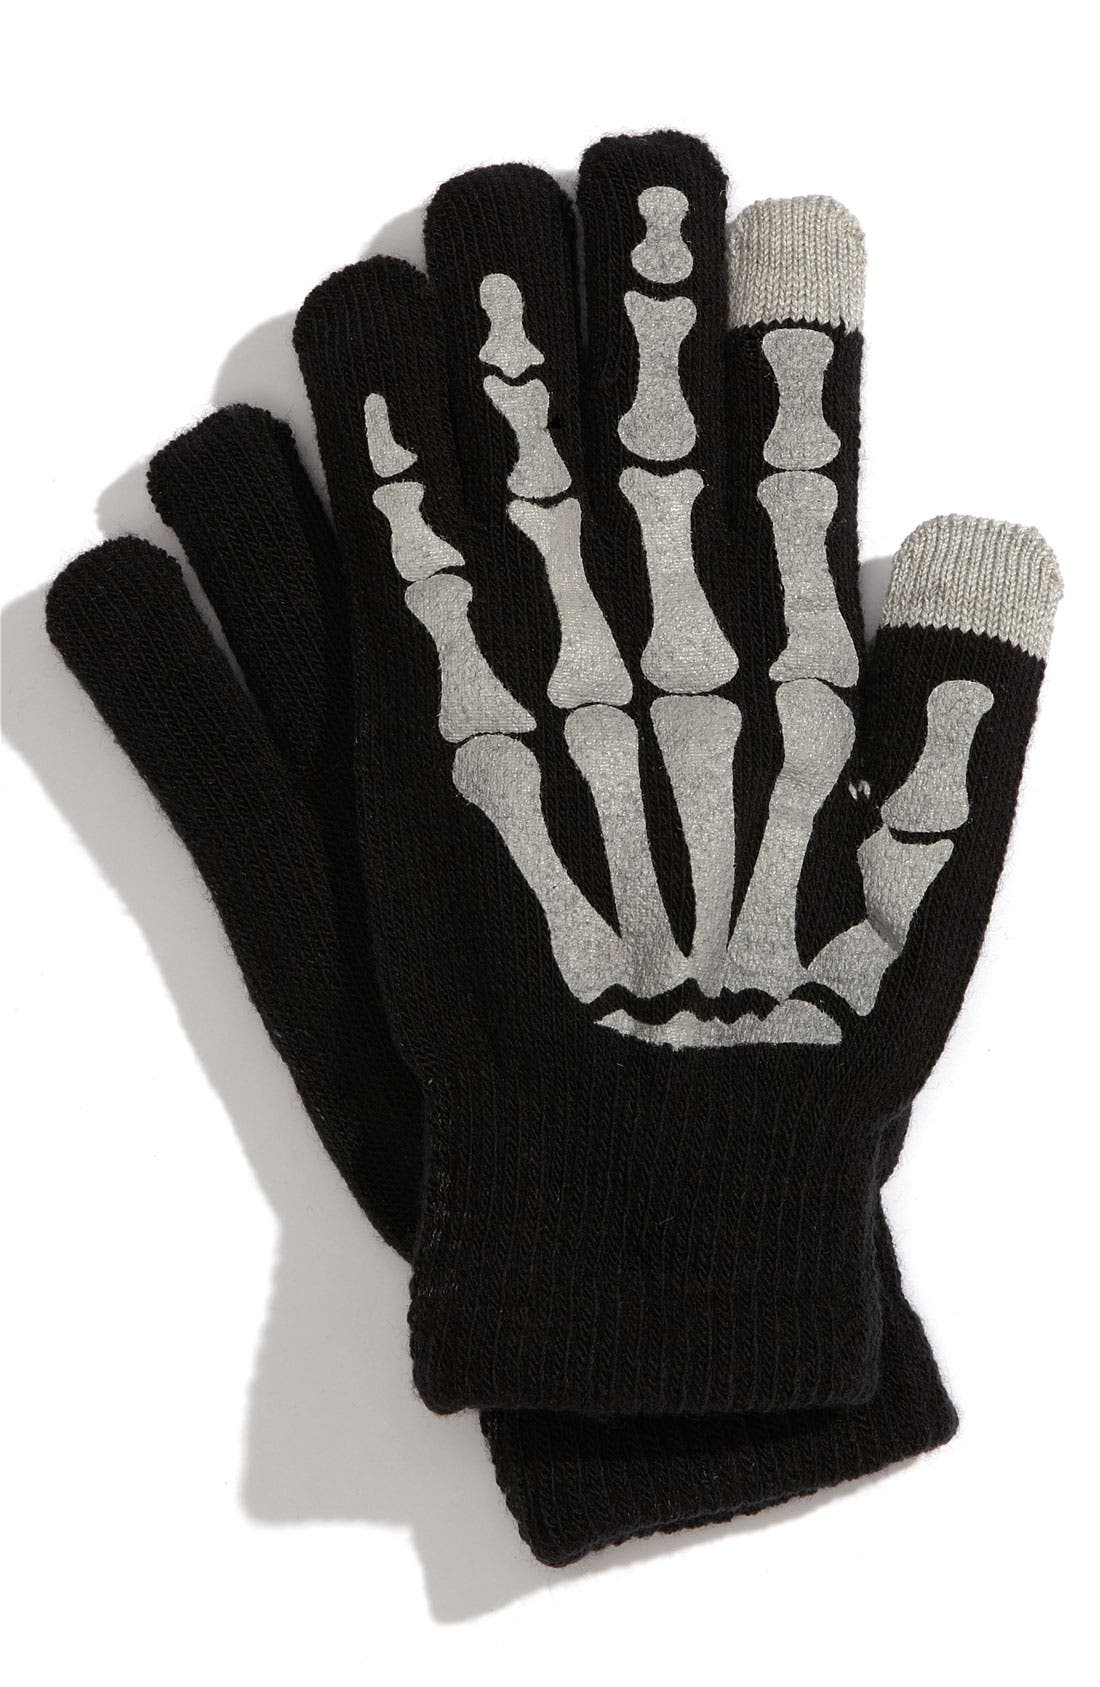 Alternate Image 1 Selected - Nolan Glove 'Skeleton' Gloves (Big Boys)